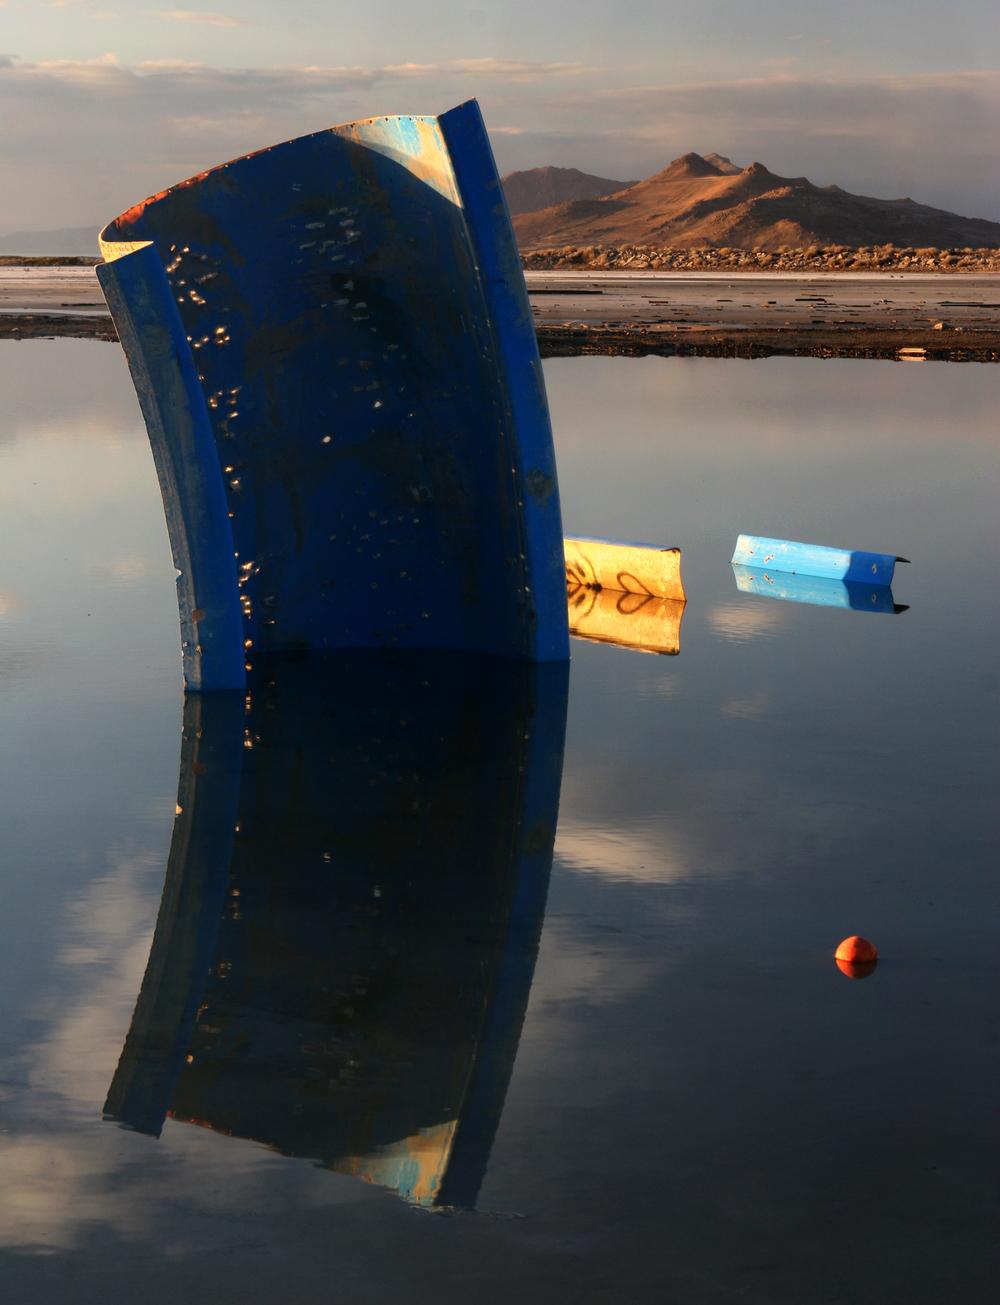 Otherworld, Great Salt Lake